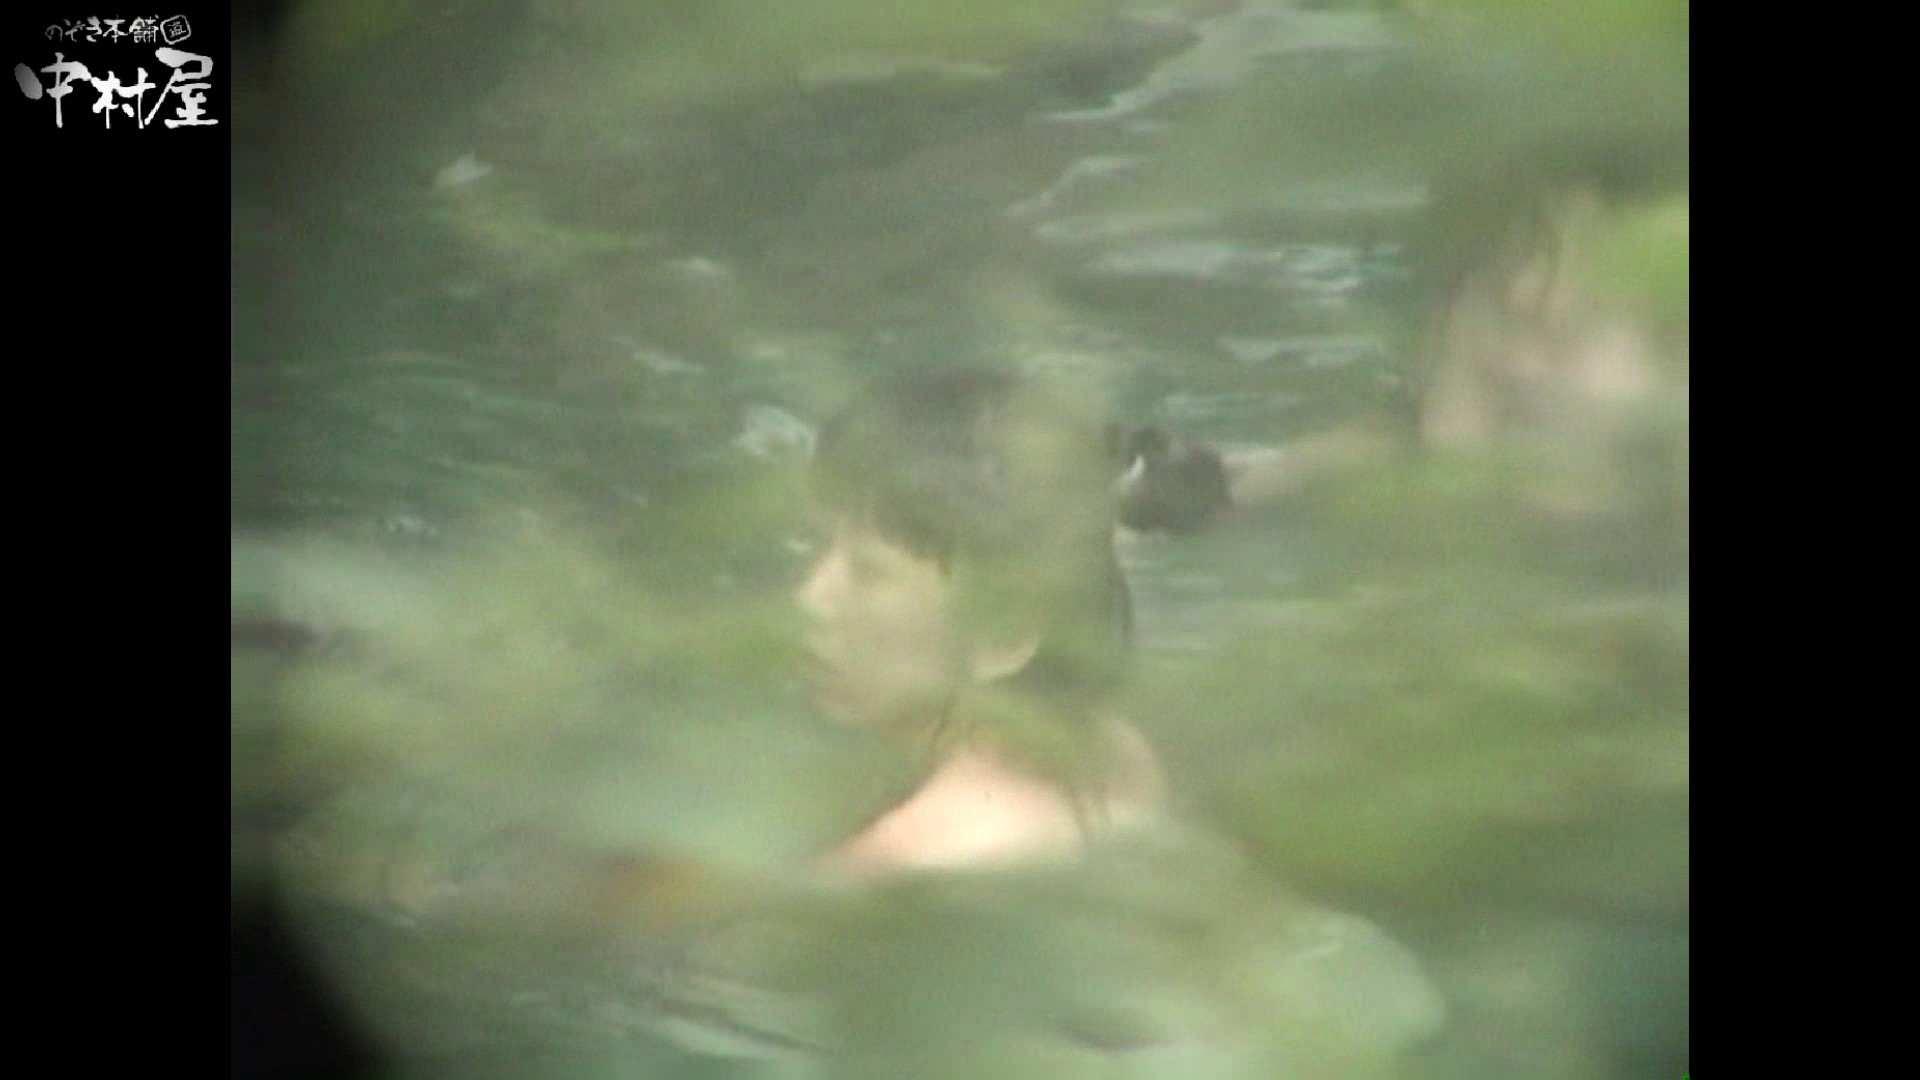 Aquaな露天風呂Vol.953 0 | 0  73連発 3